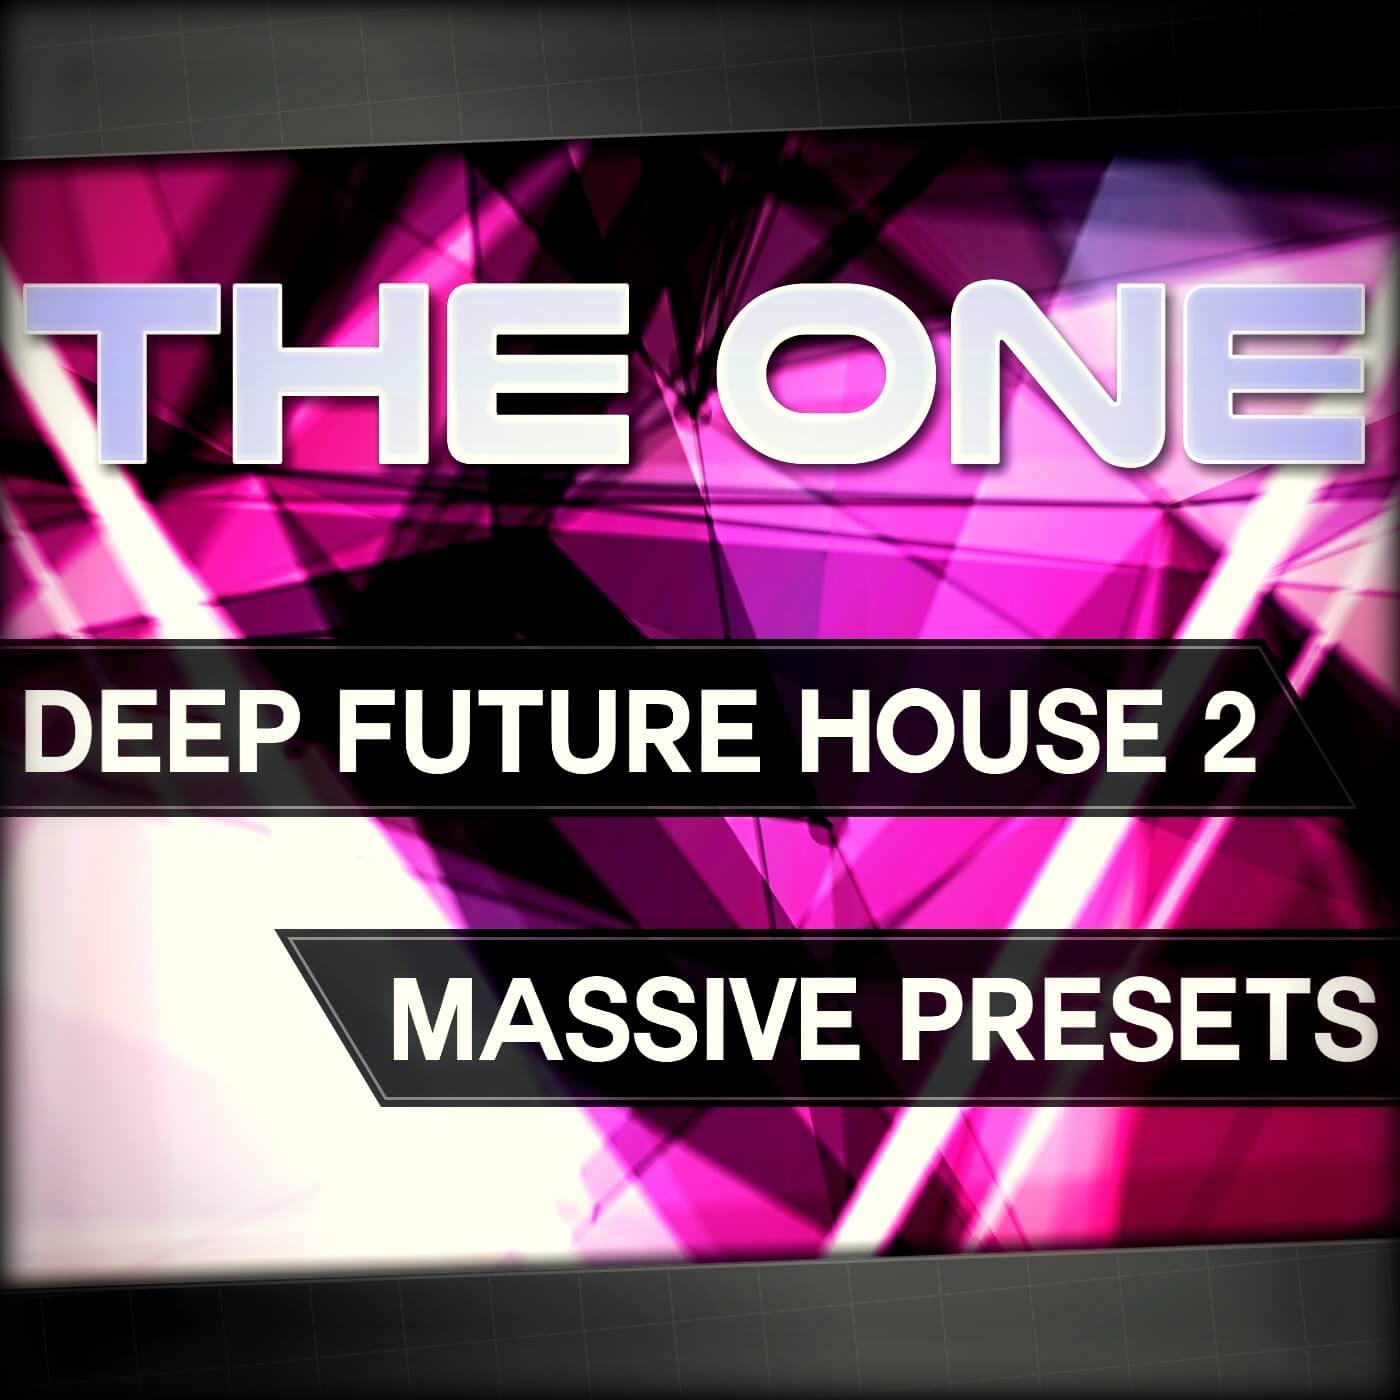 THE ONE: Deep Future House 2